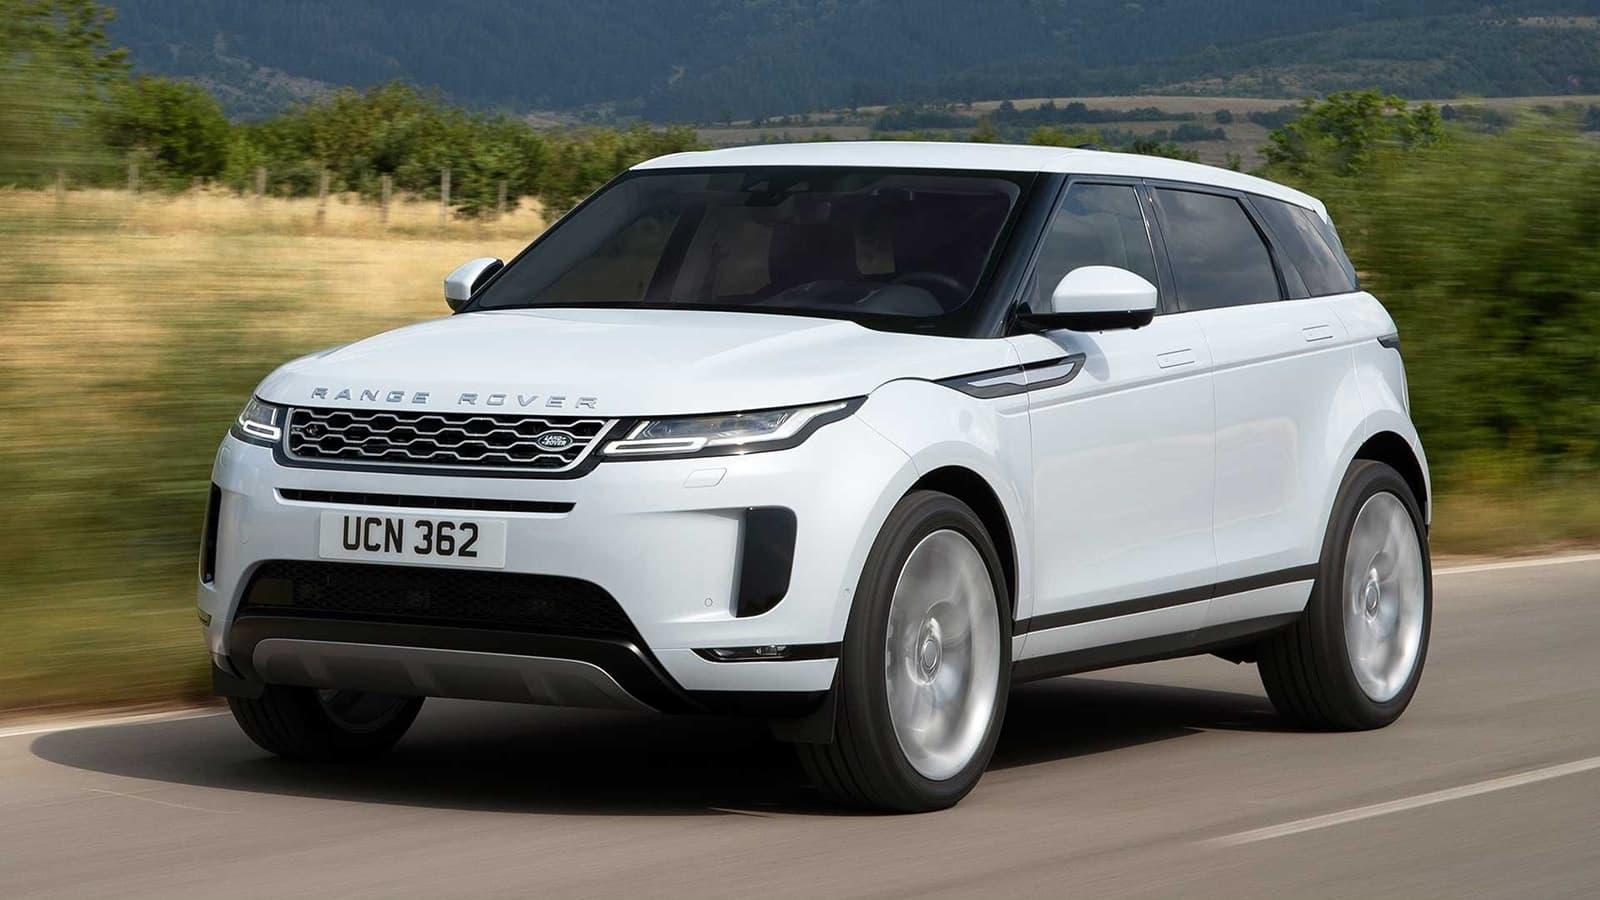 Range Rover Evoque 2019 1118 005